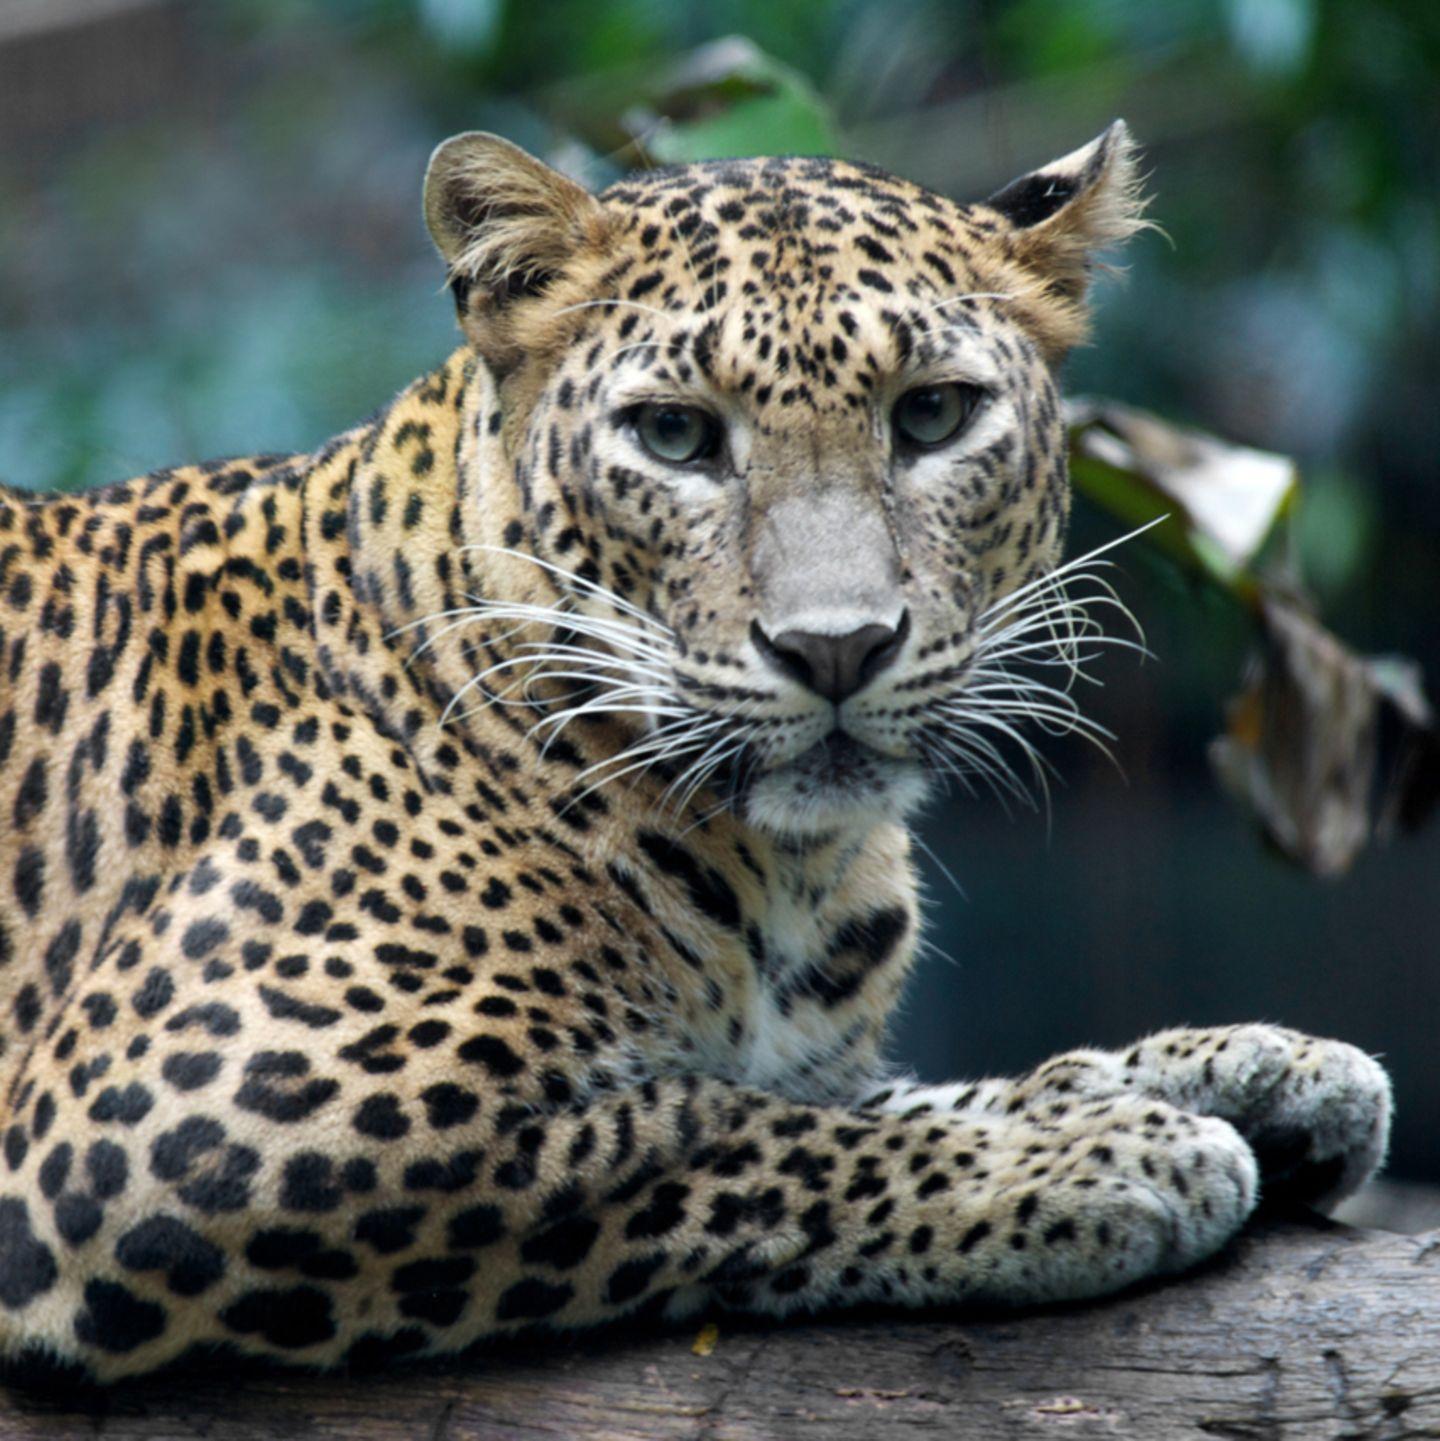 A leopard cannot change its spots   [GEOLINO]